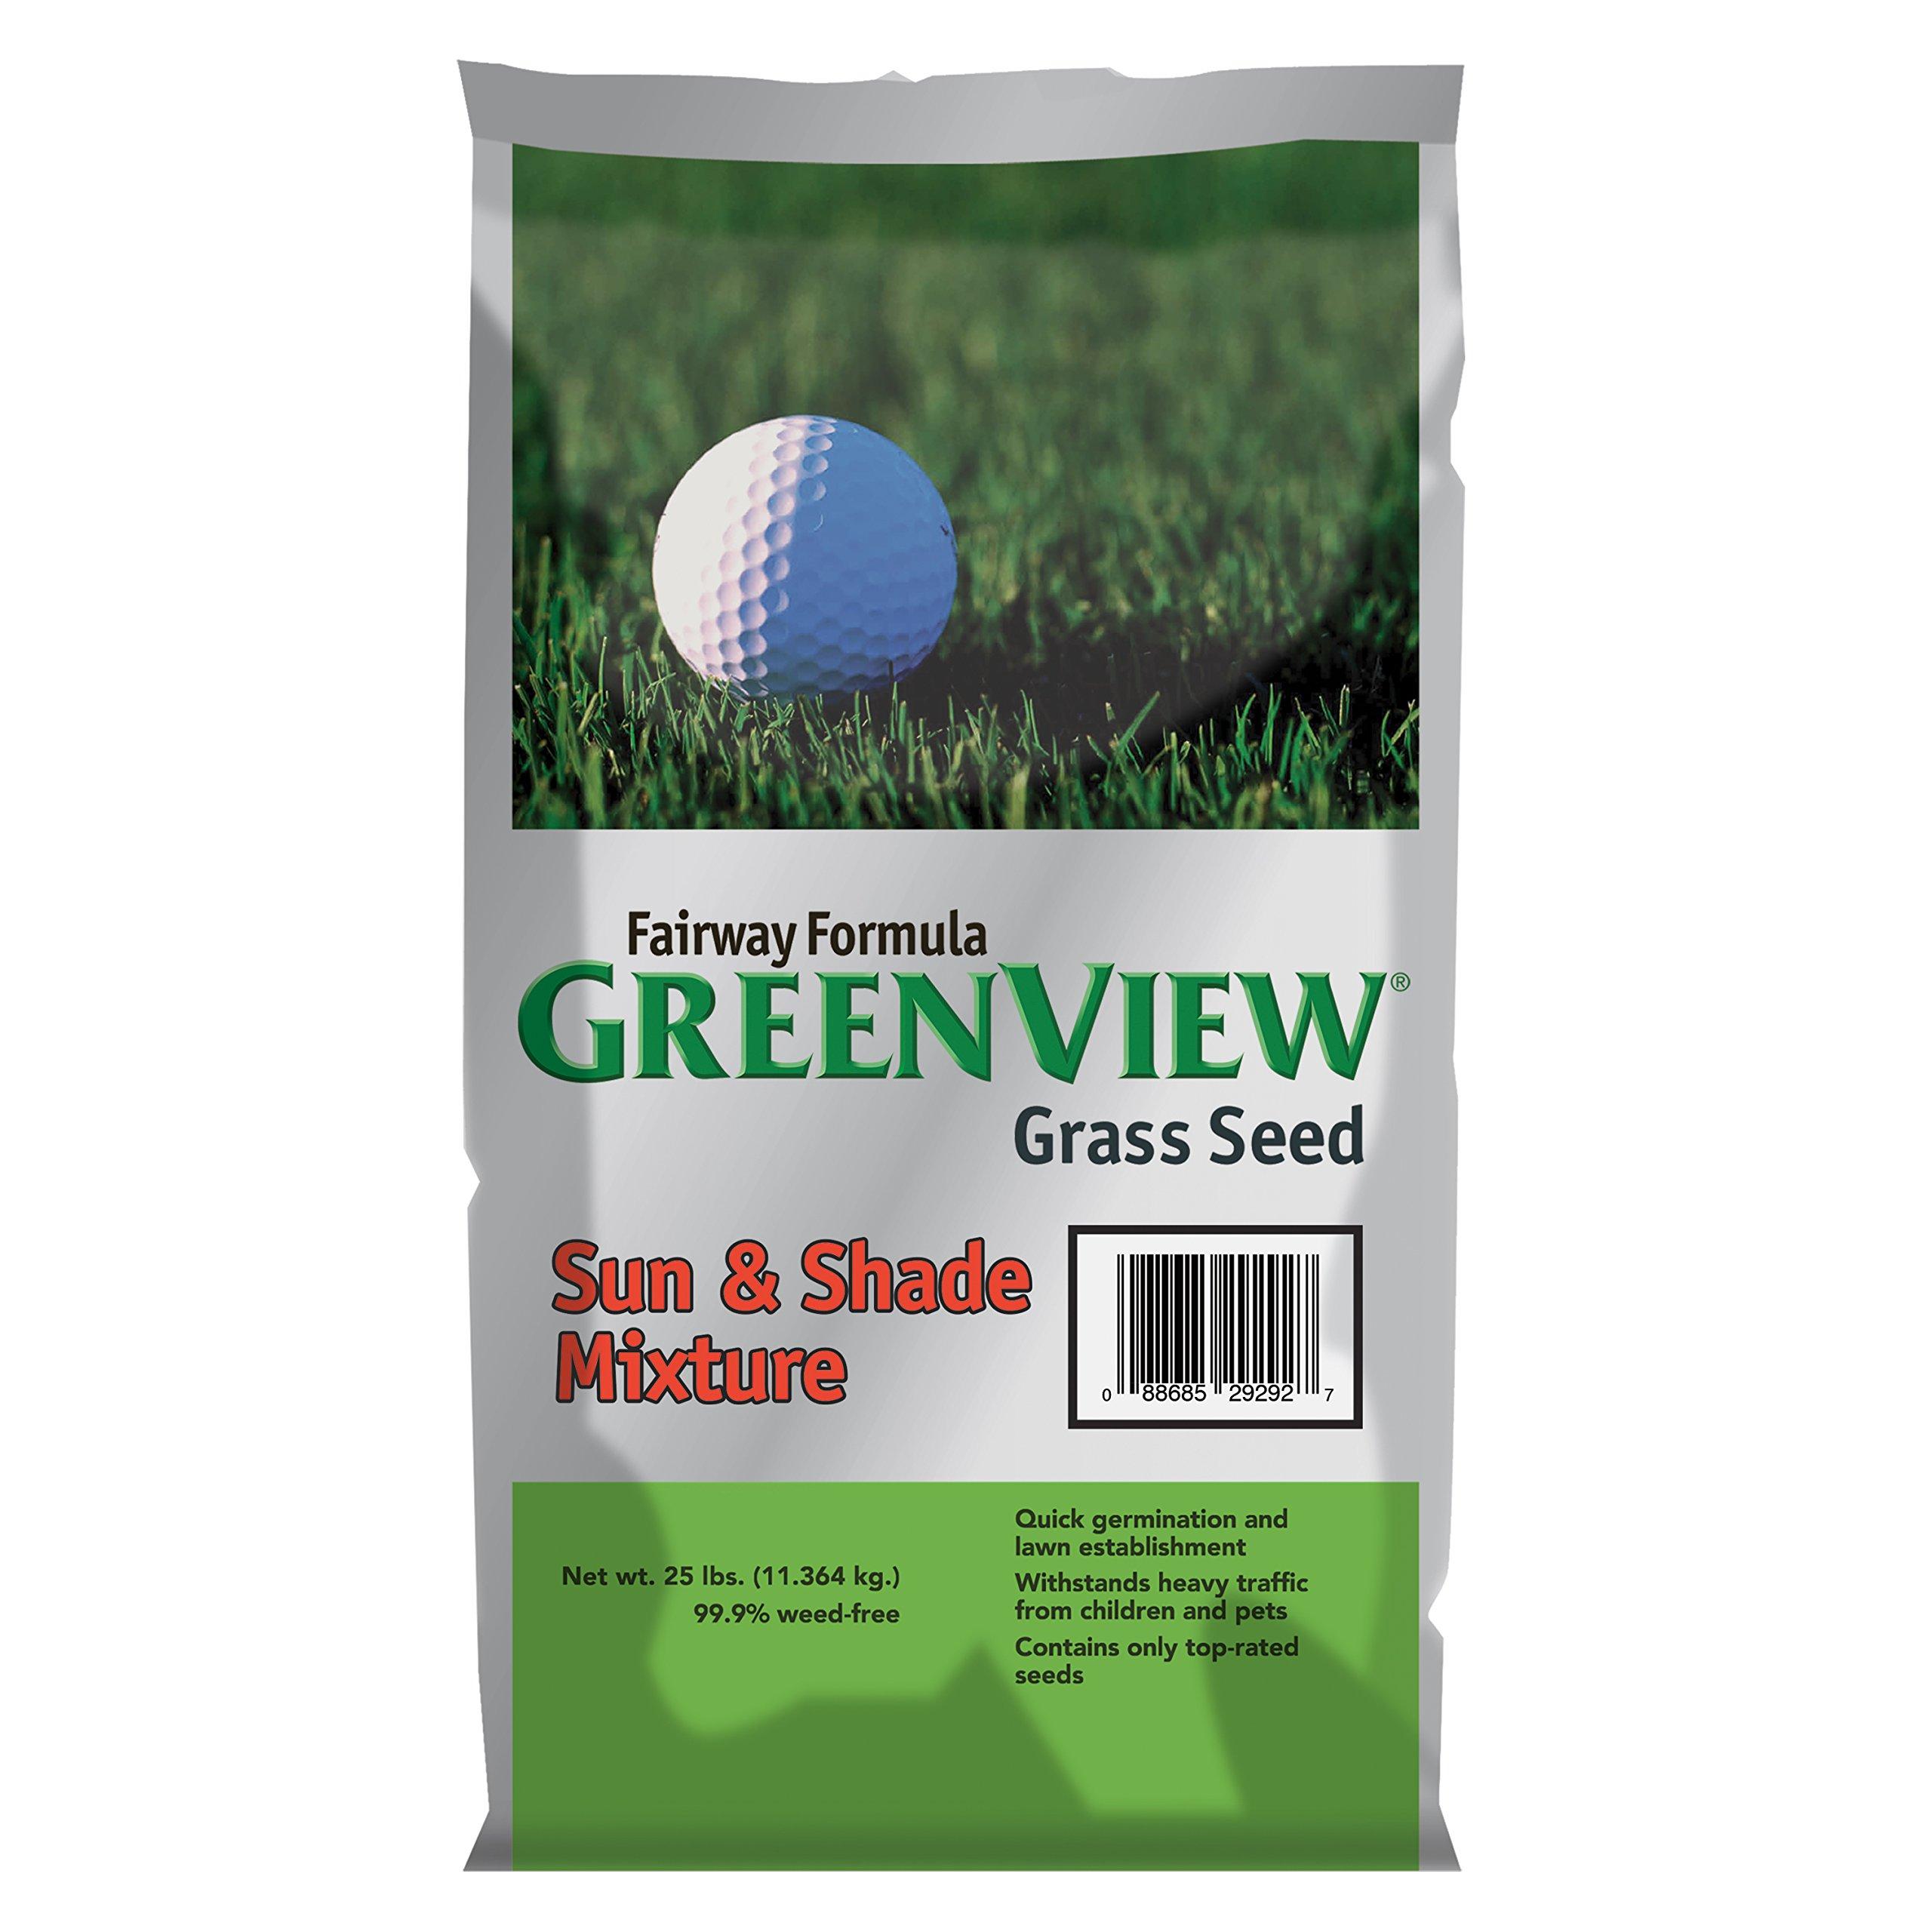 GreenView Fairway Formula Grass Seed Sun & Shade Mixture, 25 lb Bag